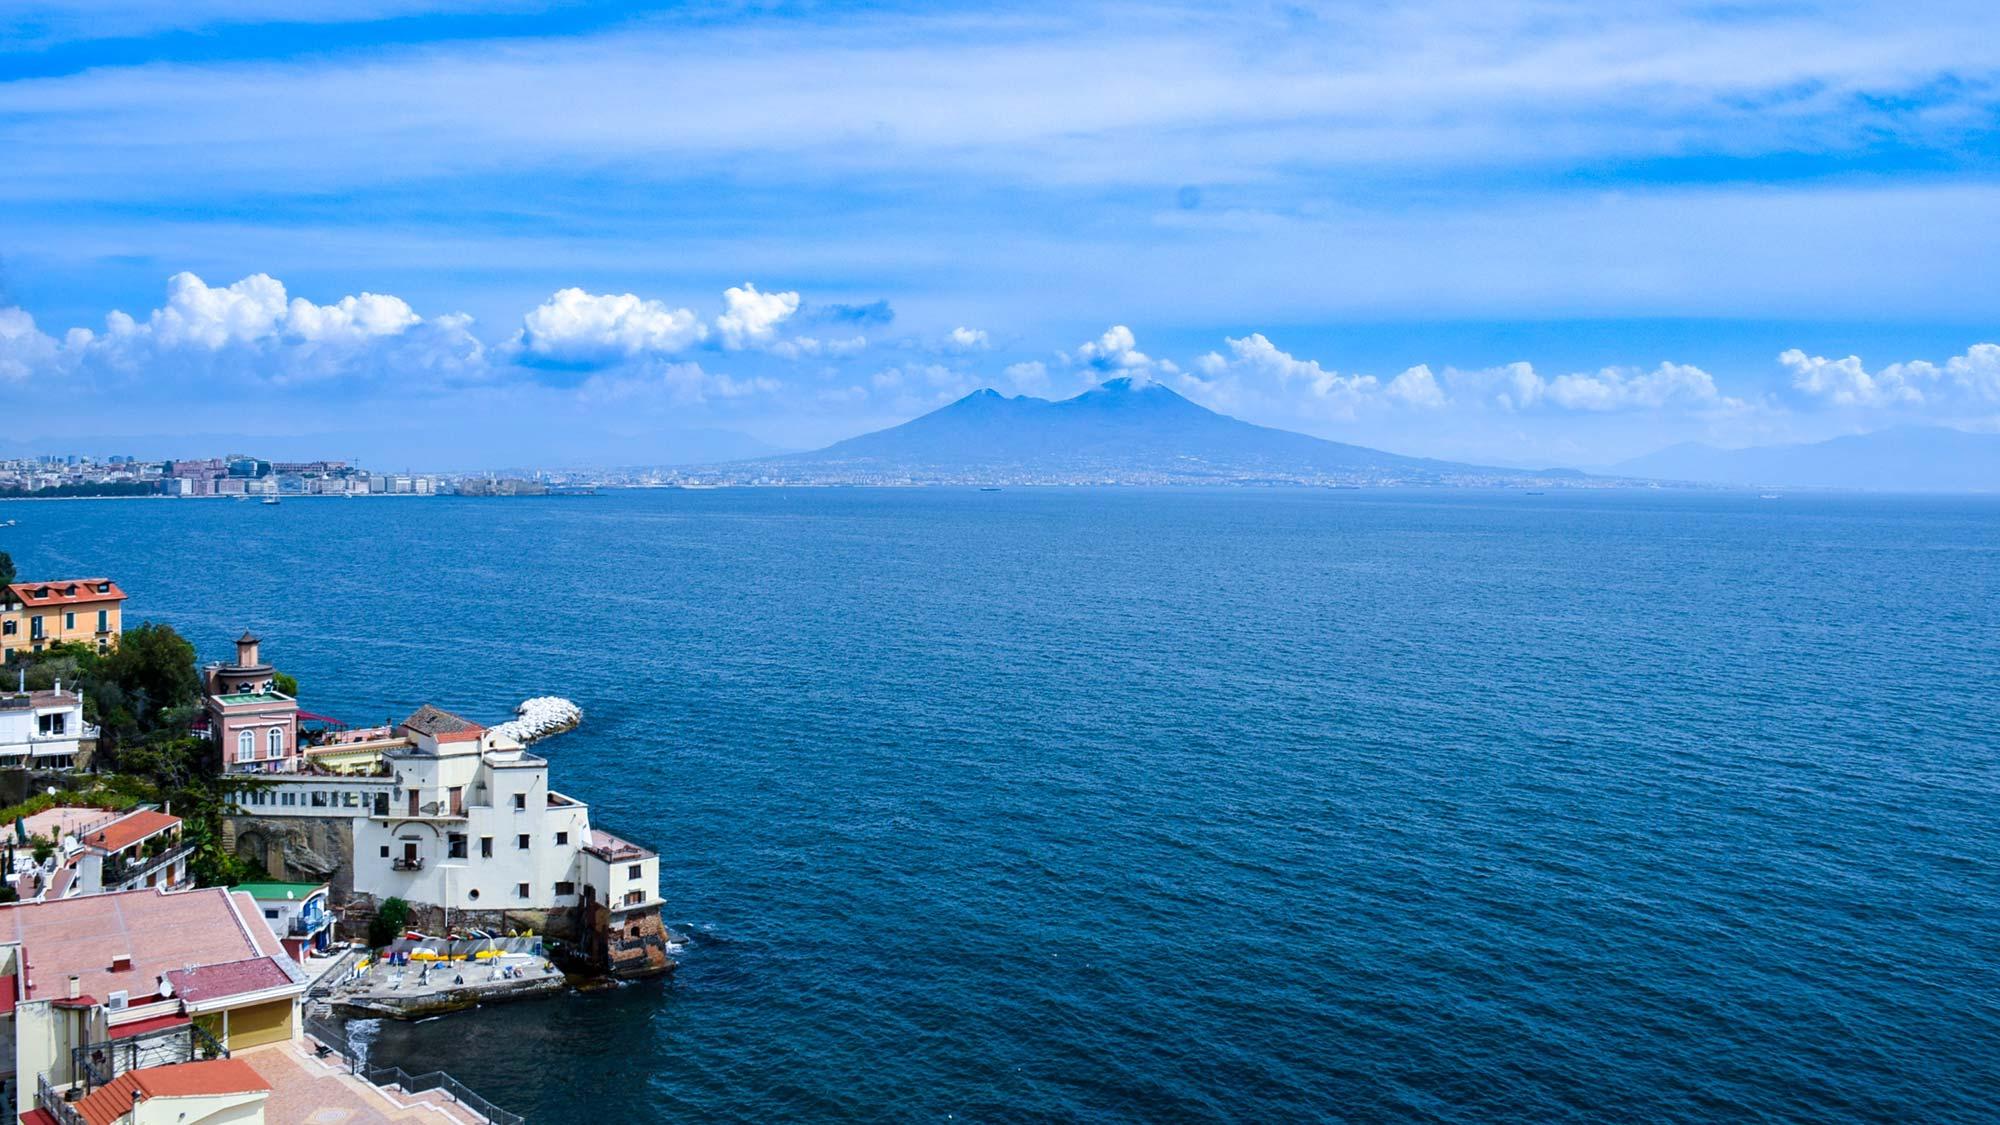 italy sea landscape